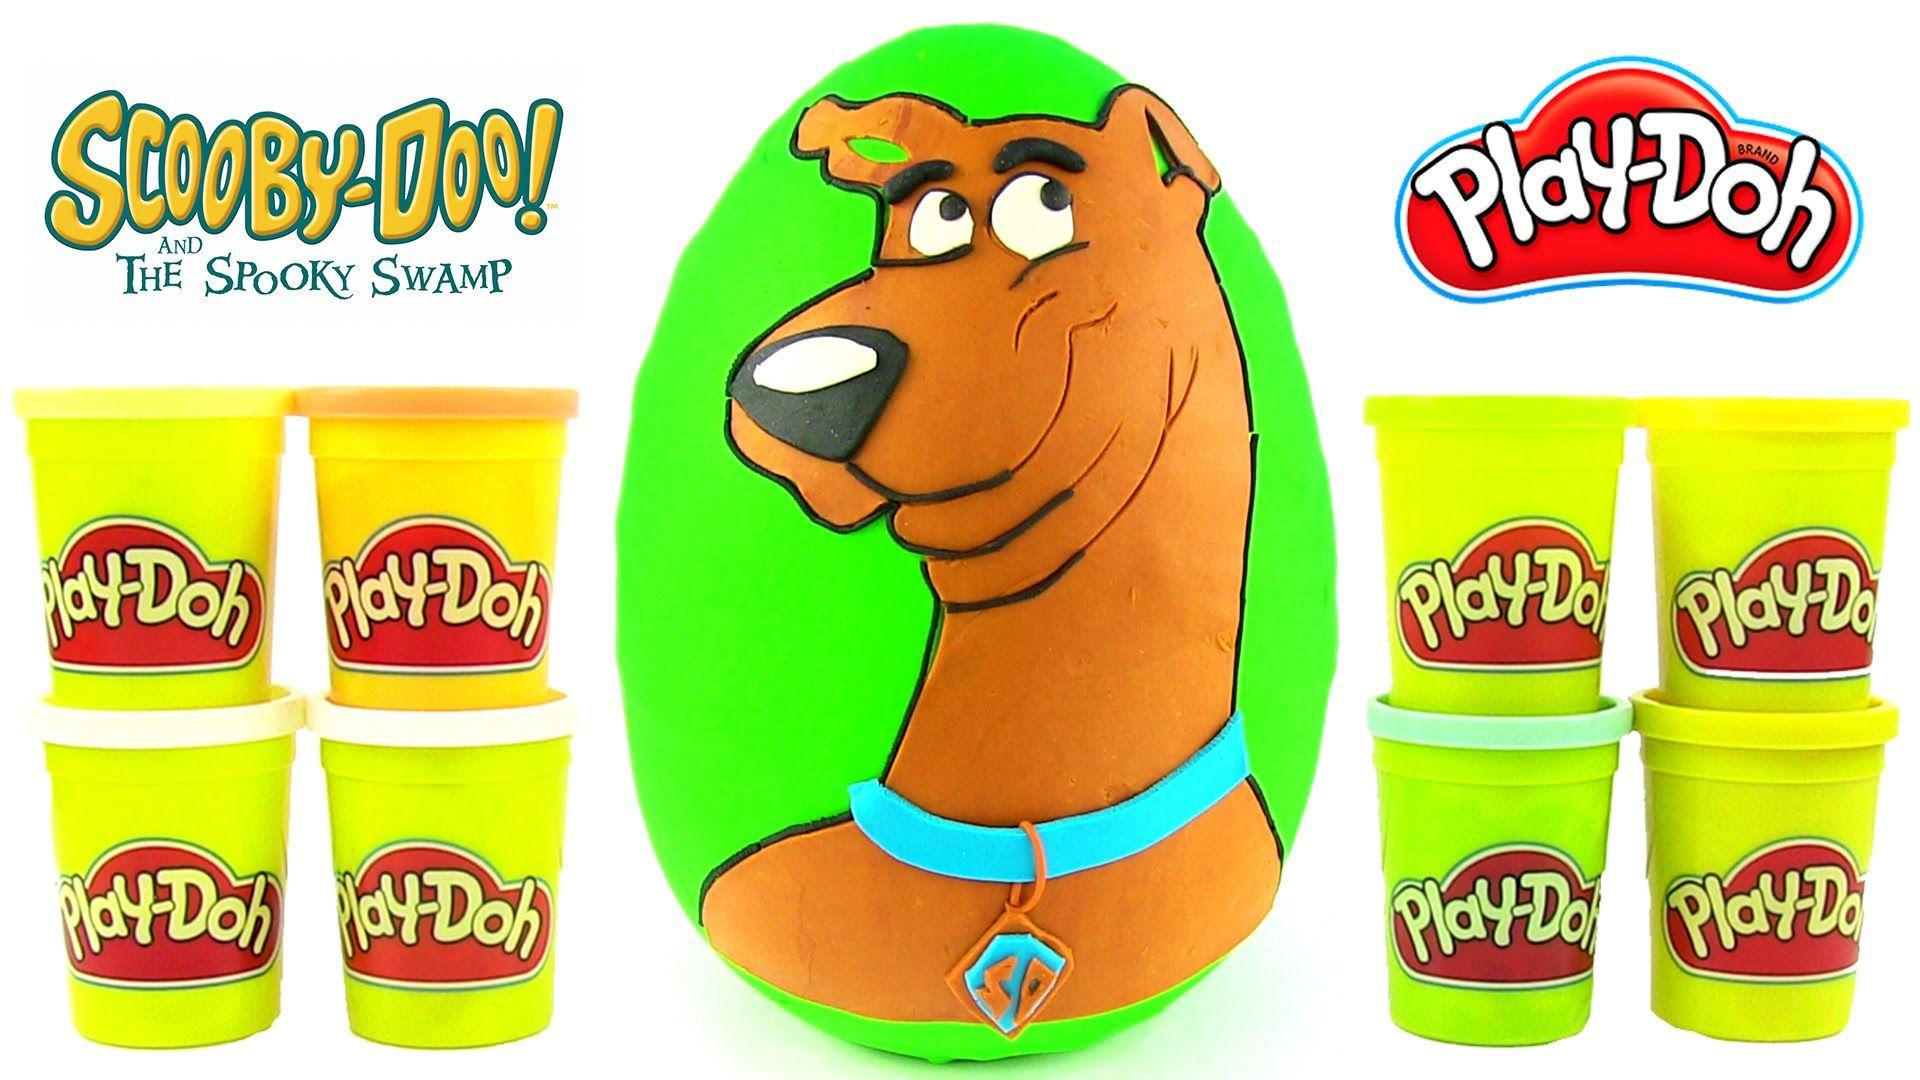 Scooby Doo Oyun Hamuru Dev Surpriz Yumurta Acma Sunger Bob Kinder Imoji Lps Mlp Oyuncaklari Scooby Doo Oyun Hamuru Lps